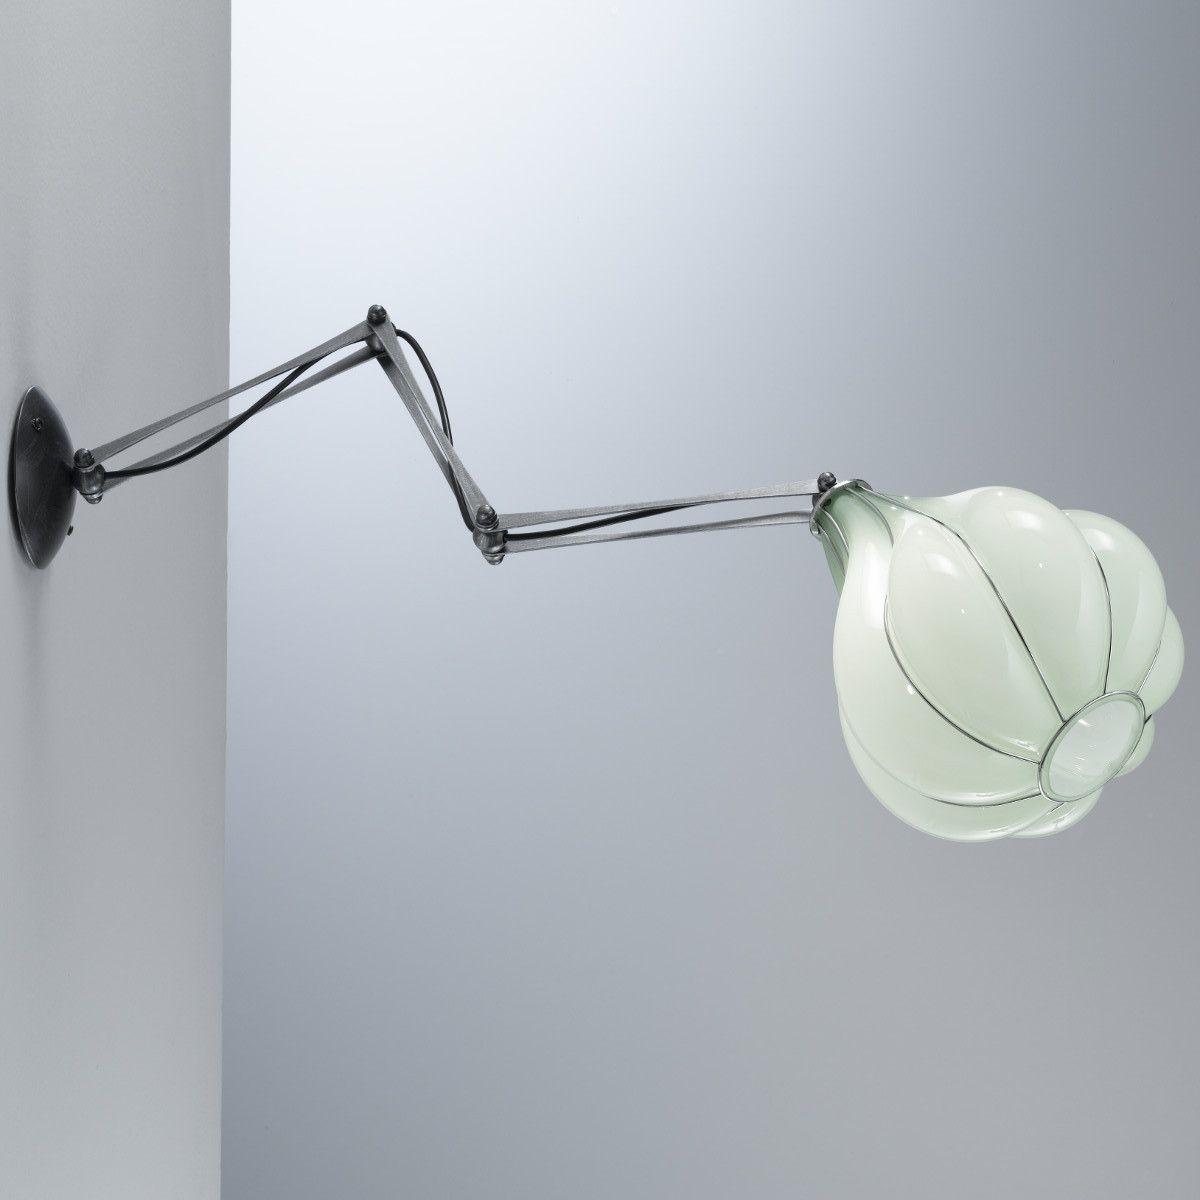 applique murale articul e en verre souffl chez. Black Bedroom Furniture Sets. Home Design Ideas